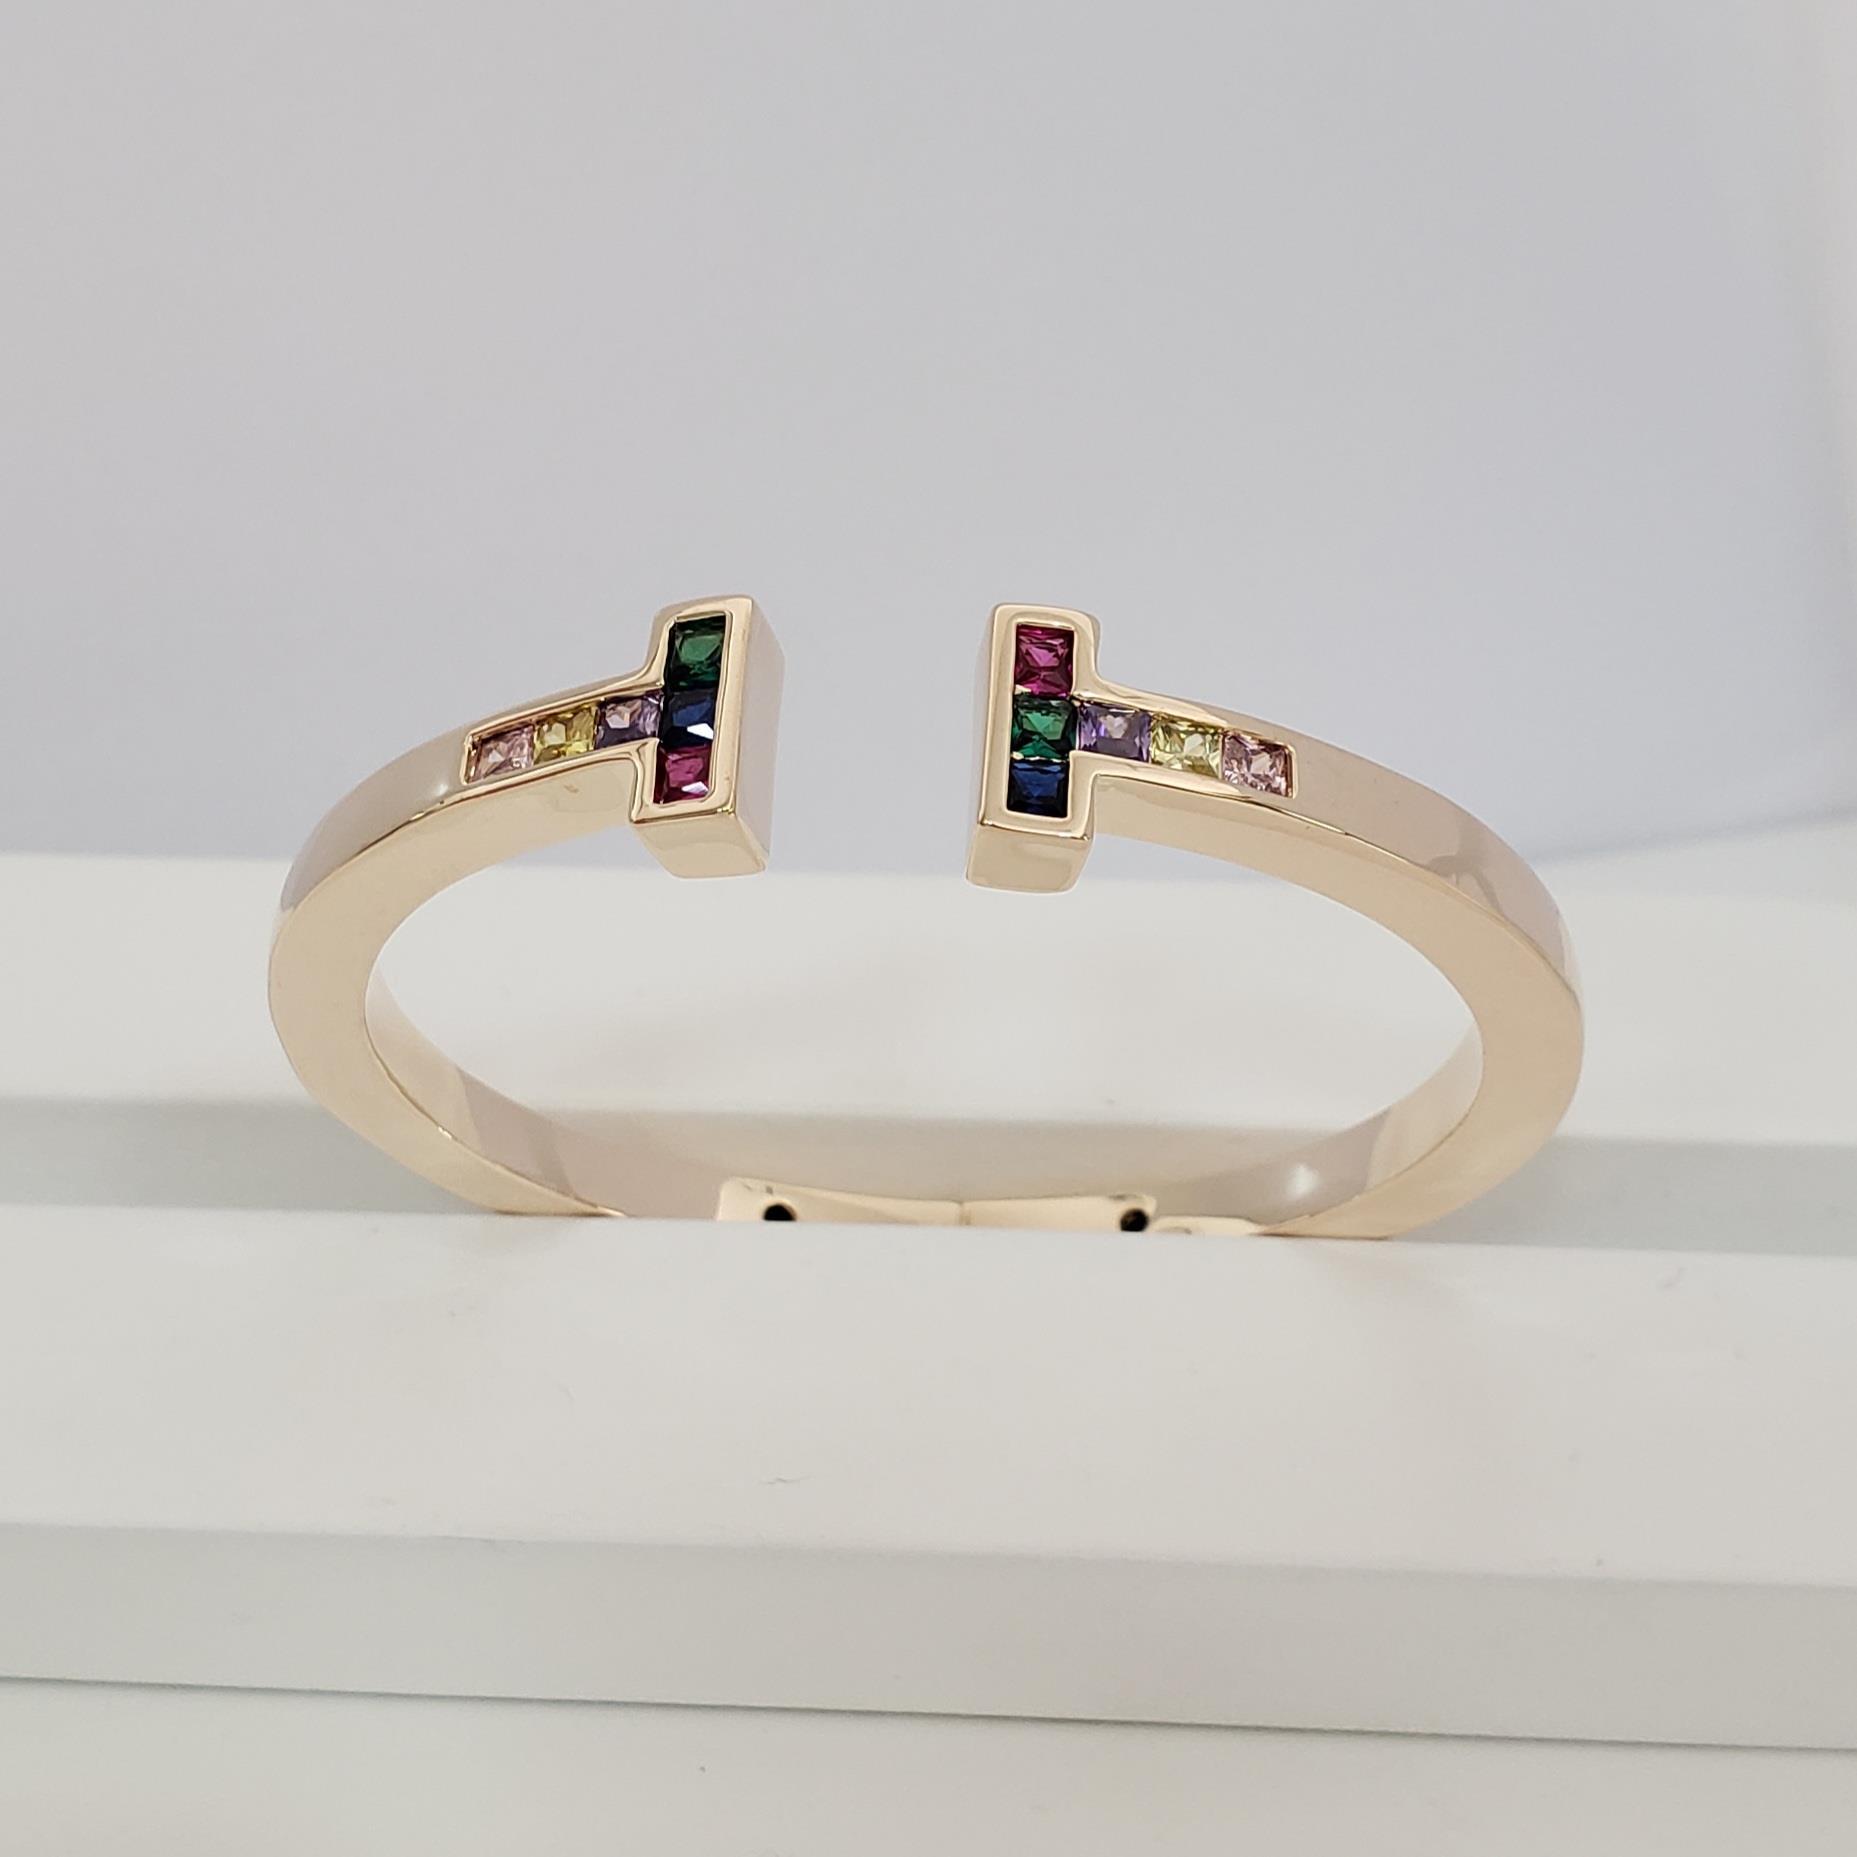 Bracelete Releitura Tiffany Aberto com T Zircônia Colorida  no Banho Ouro 18k Semijoia